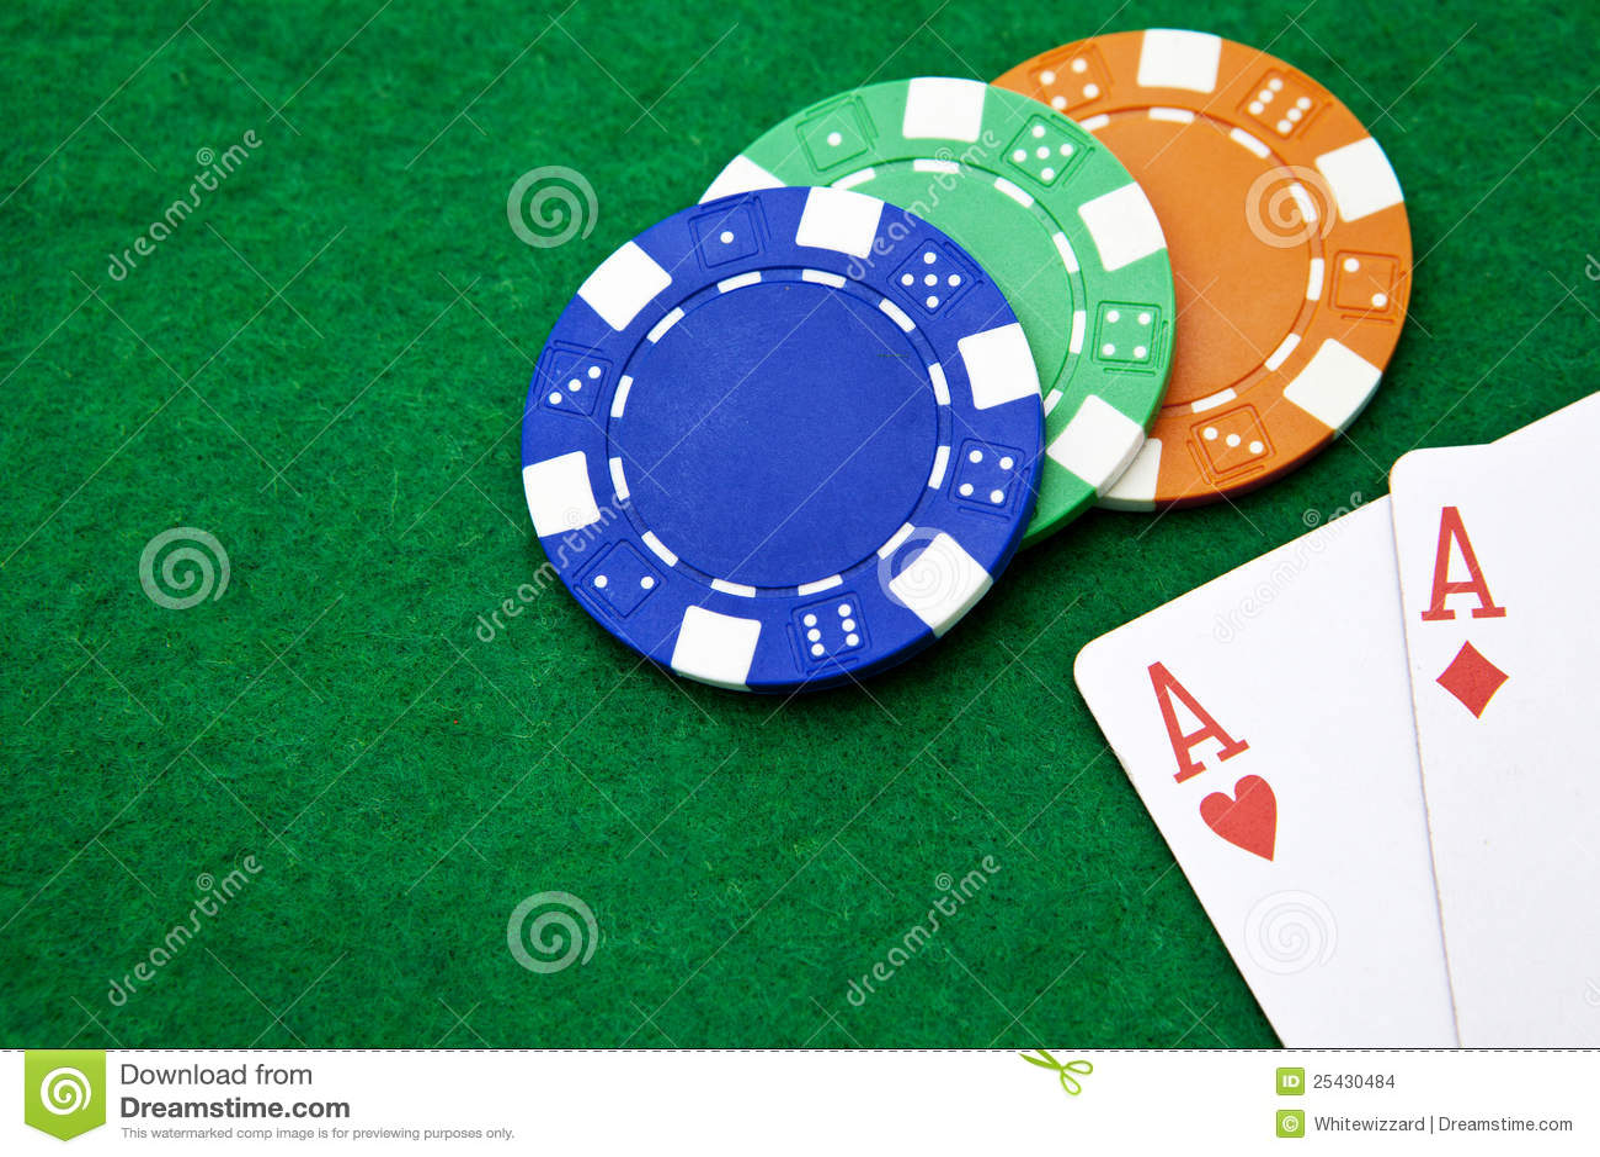 harrington casino texas holdem